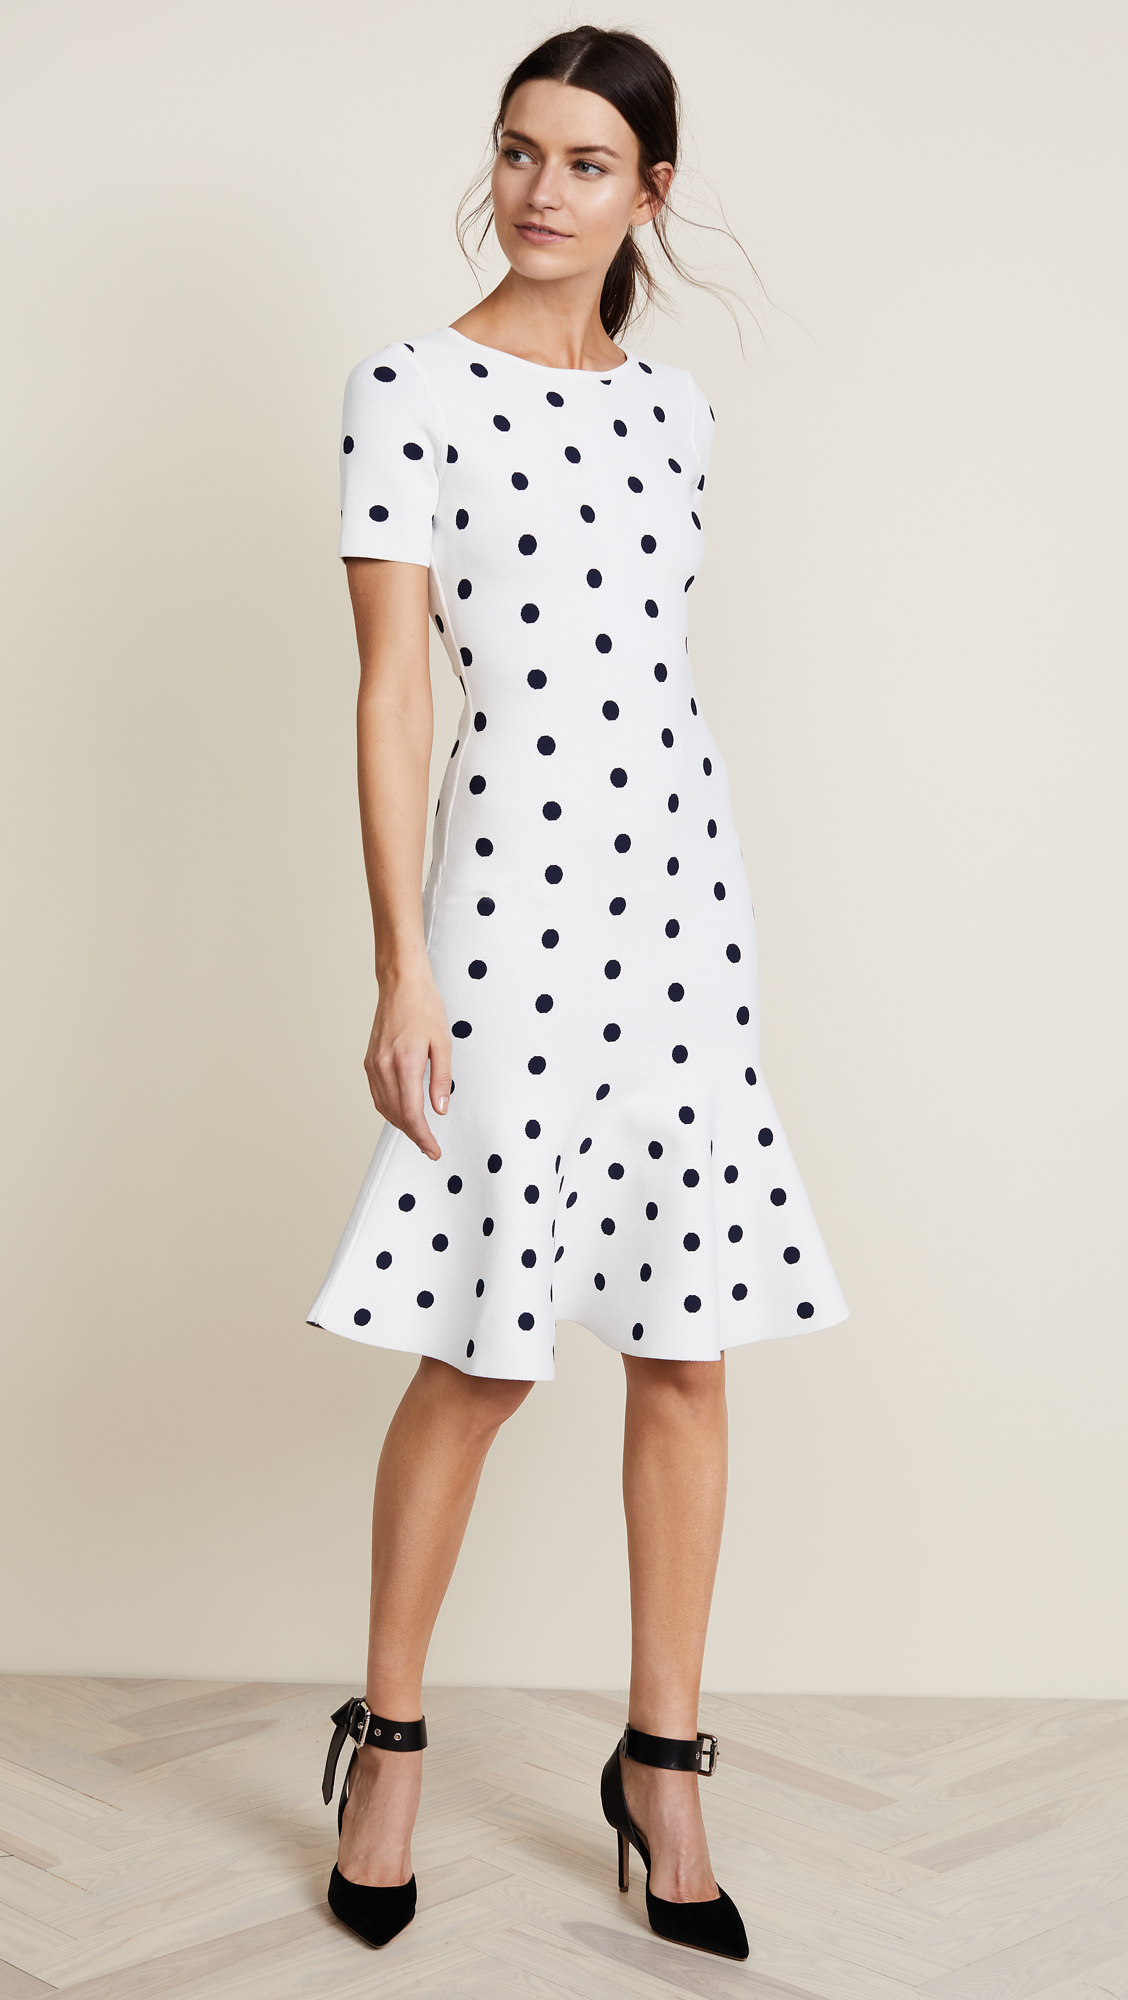 5c971d196c42 Milly Polka Dot Mermaid Dress   SHOPBOP